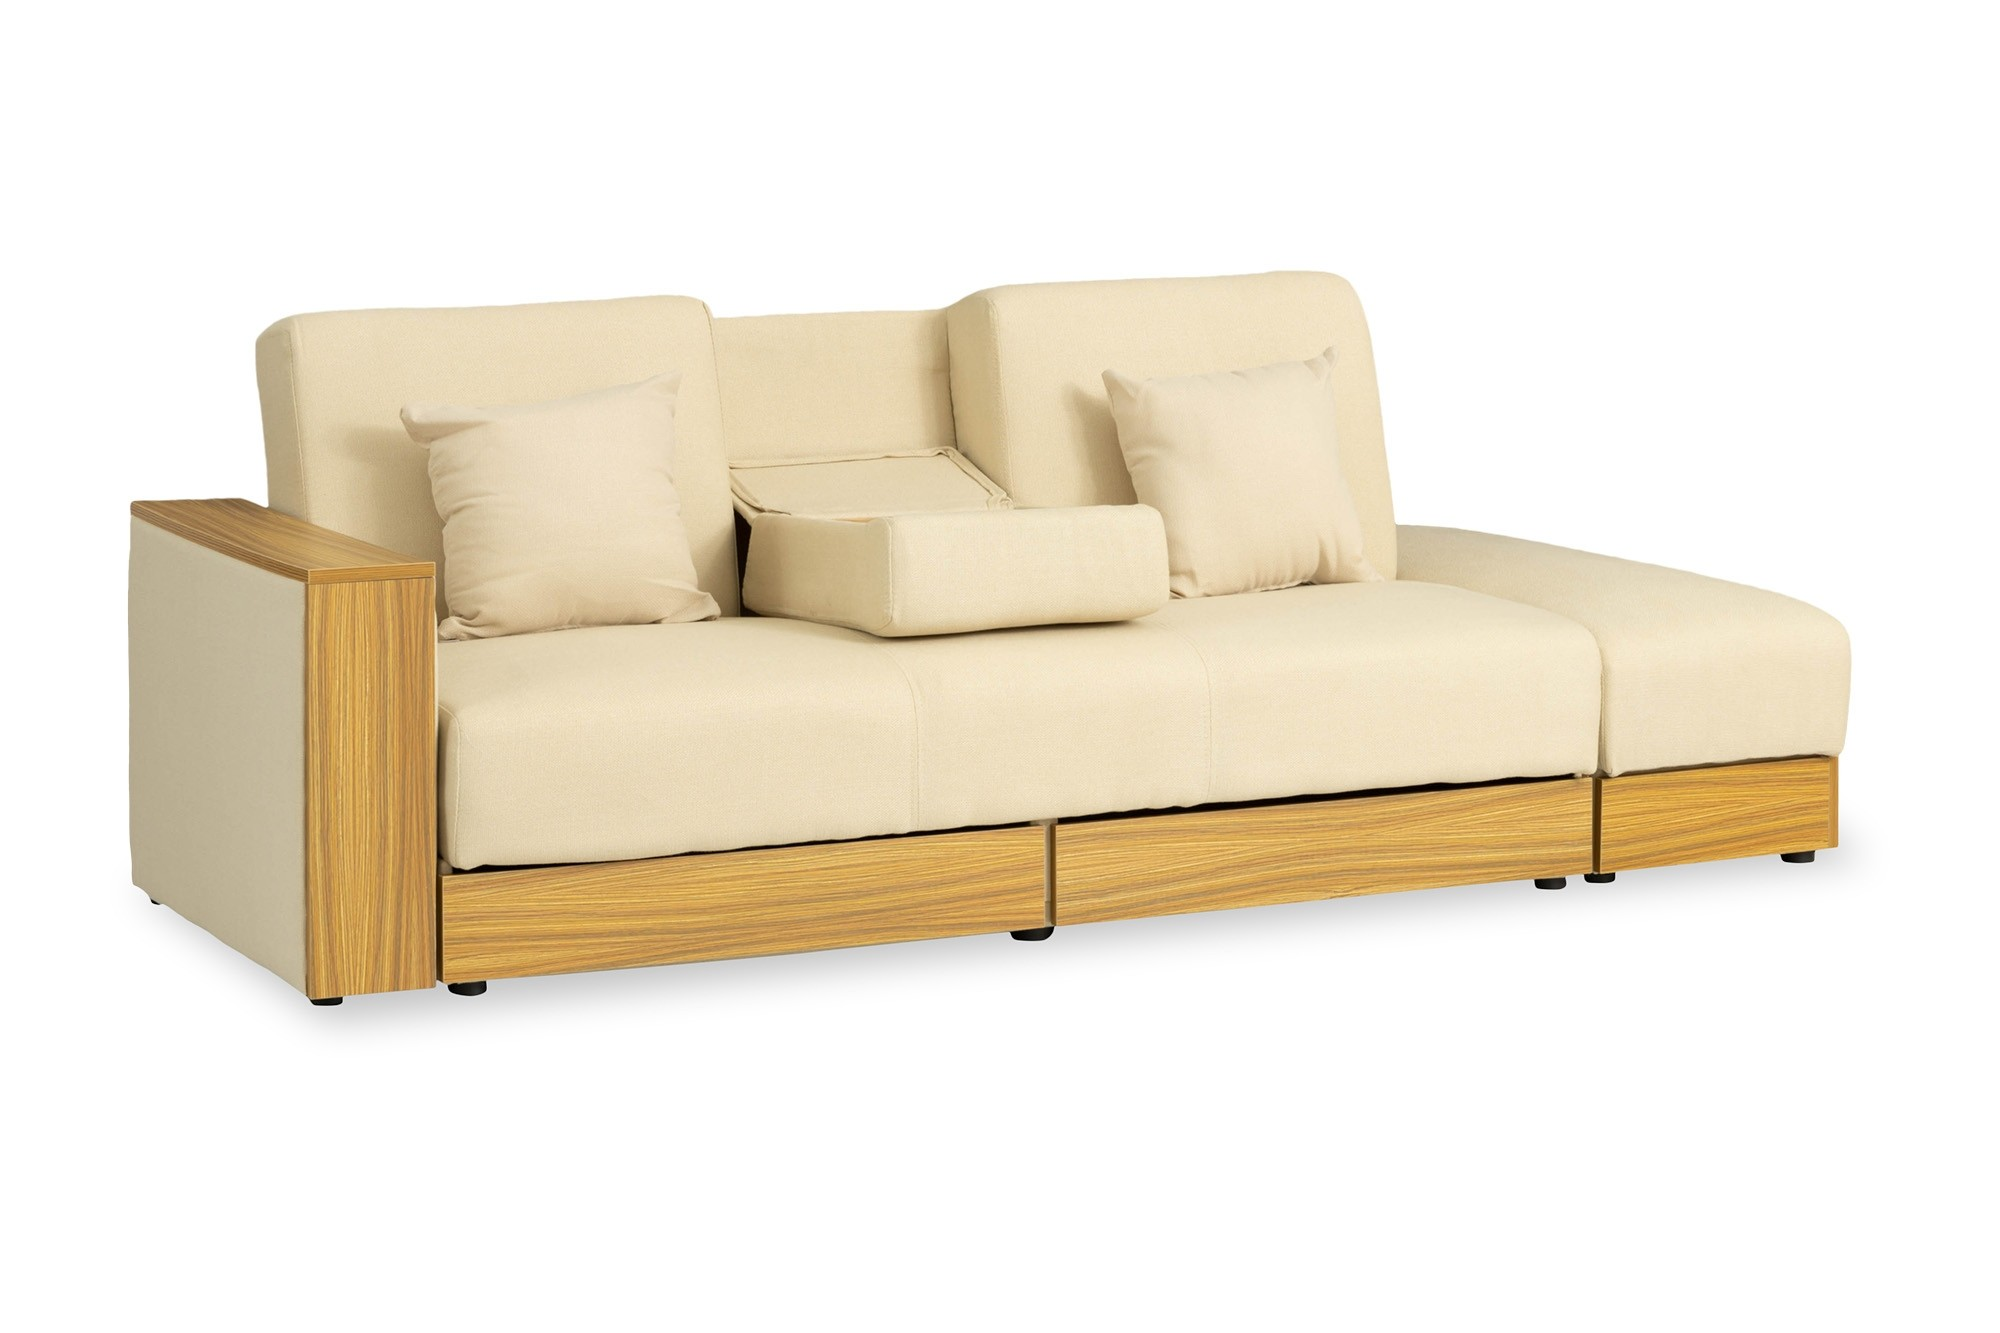 Sarai Storage Sofa Bed Fabric Beige